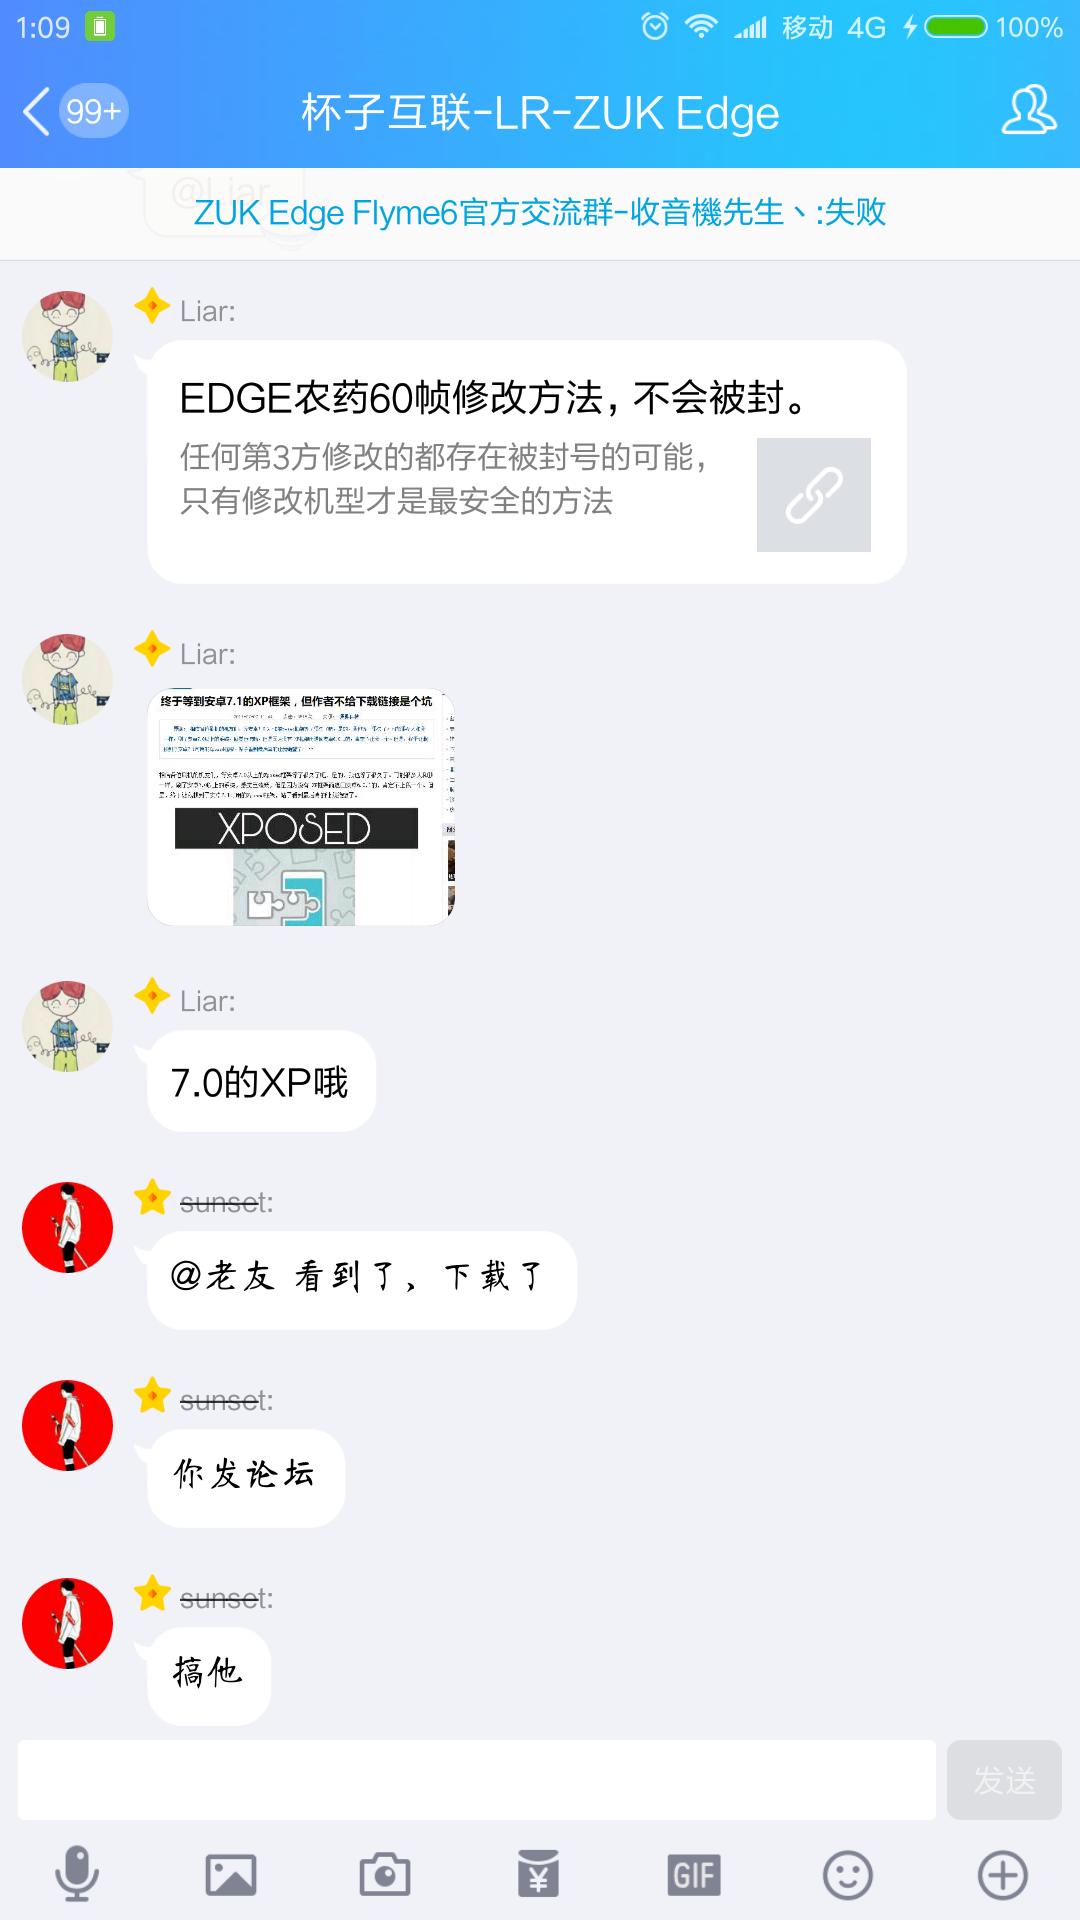 Screenshot_2017-07-09-01-09-22-862_com.tencent.mobileqq.png